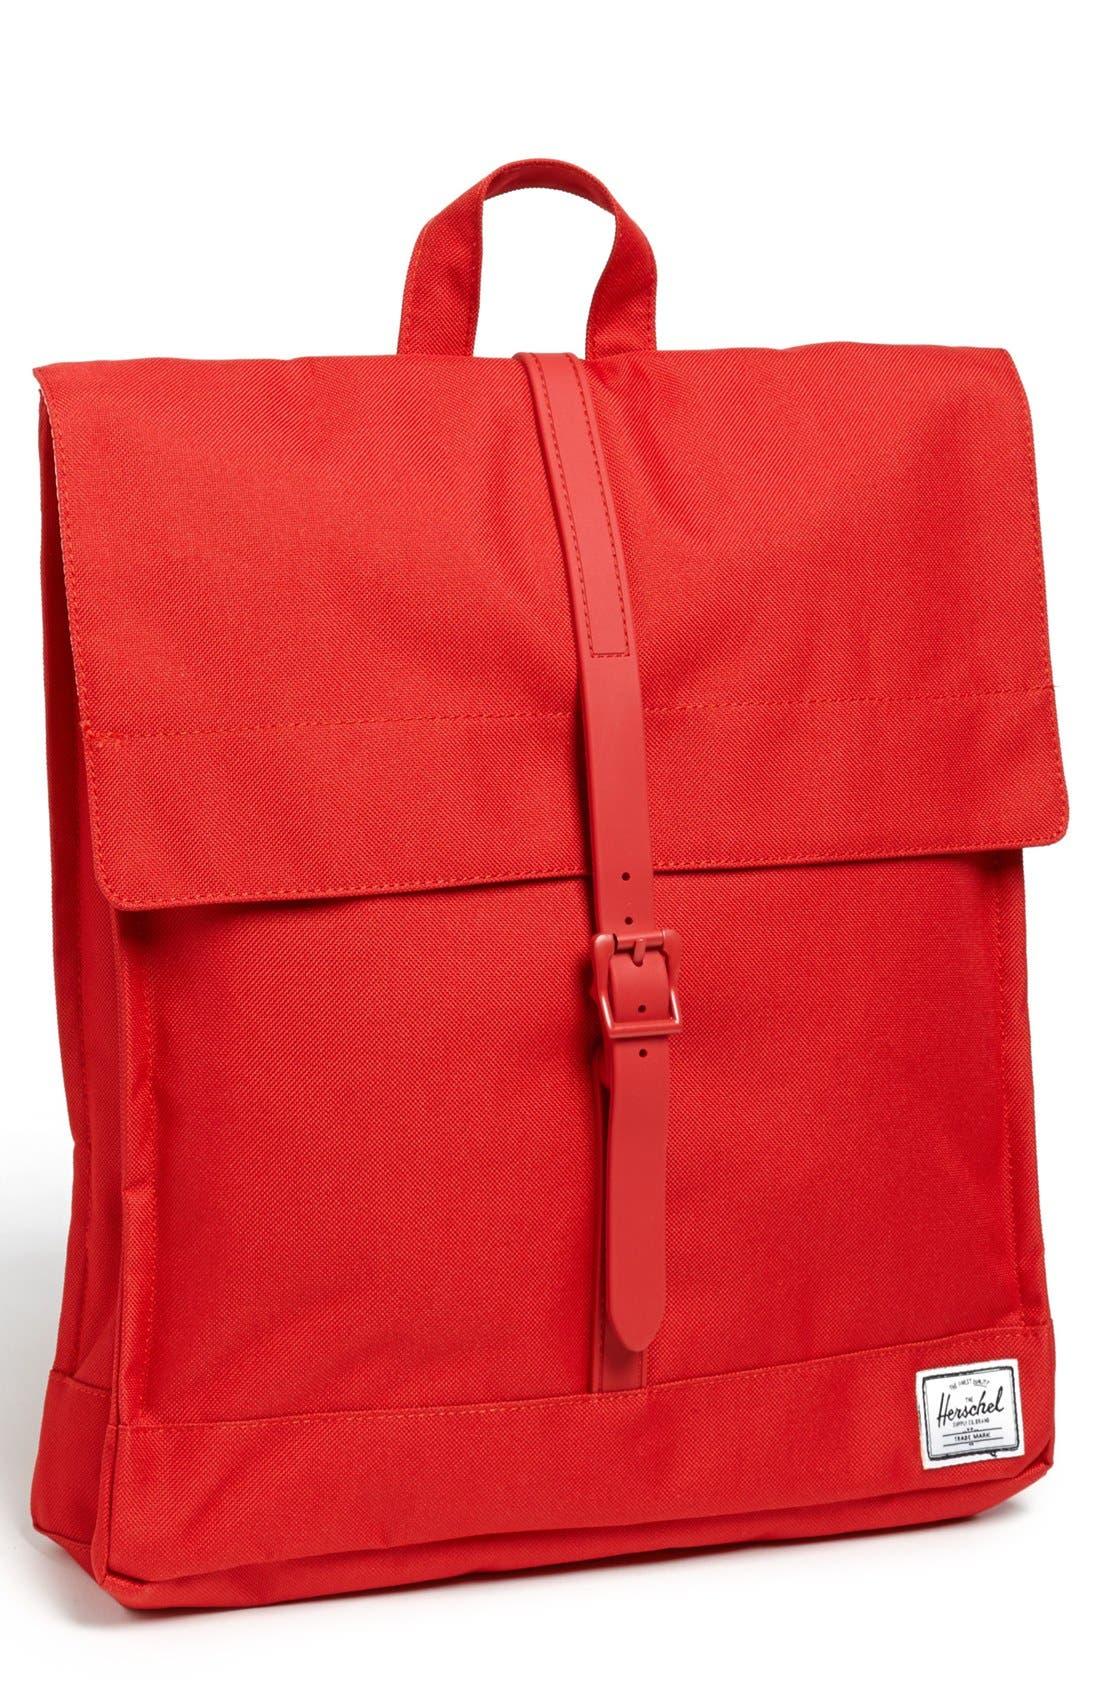 Alternate Image 1 Selected - Herschel Supply Co. 'City - Mid Volume' Backpack